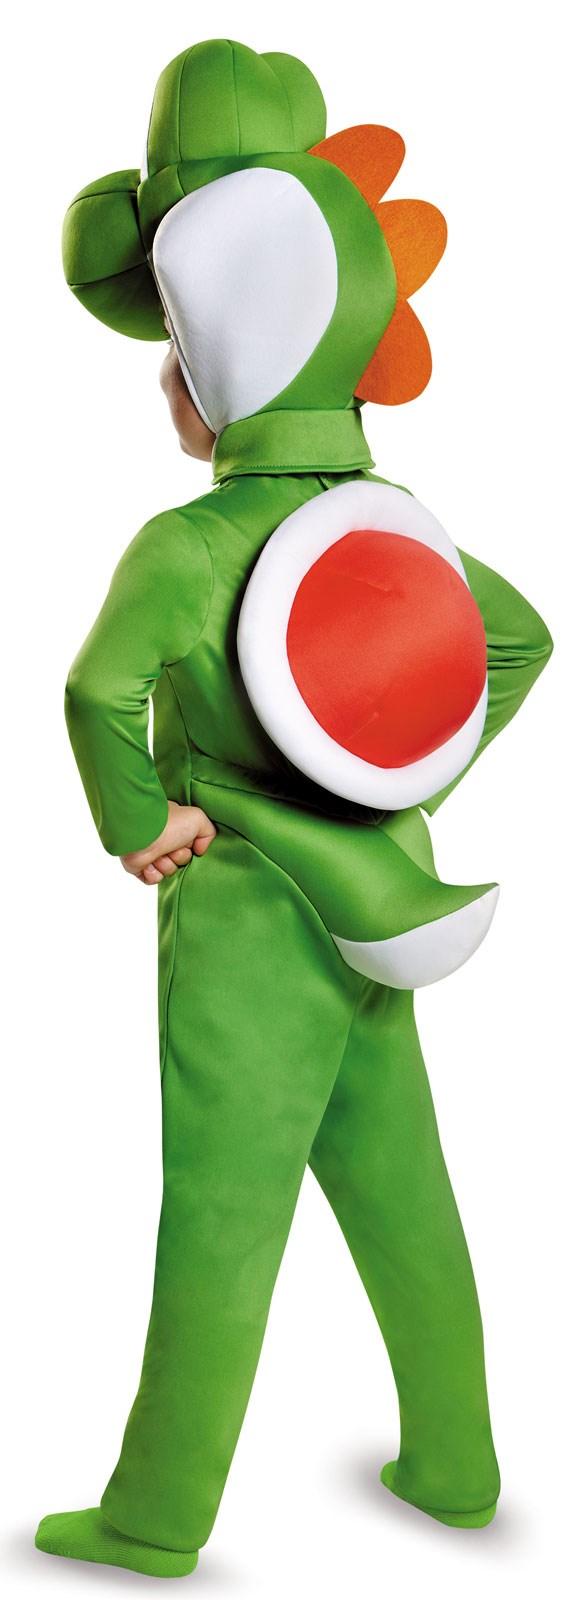 Super Mario Bros: Yoshi Costume For Toddlers | BuyCostumes.com